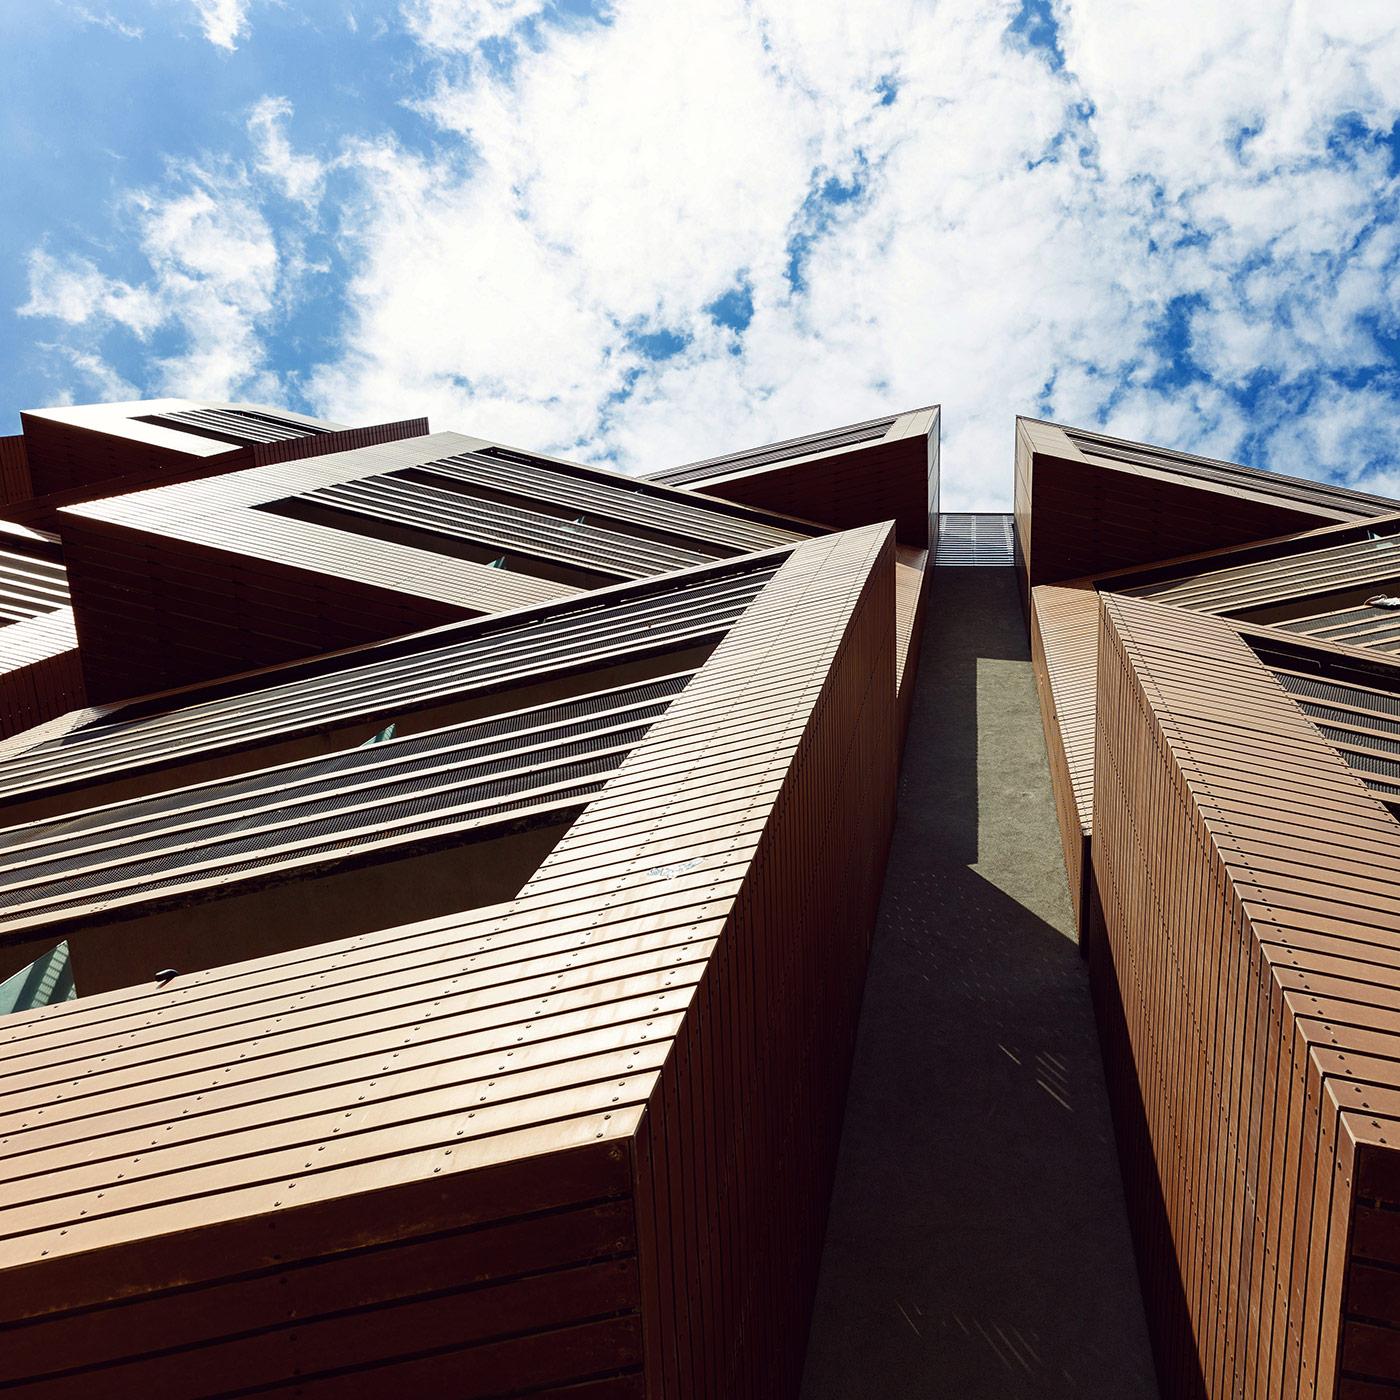 Basket Apartments <br />Location: Paris, France <br />Architect: OFIS Architects